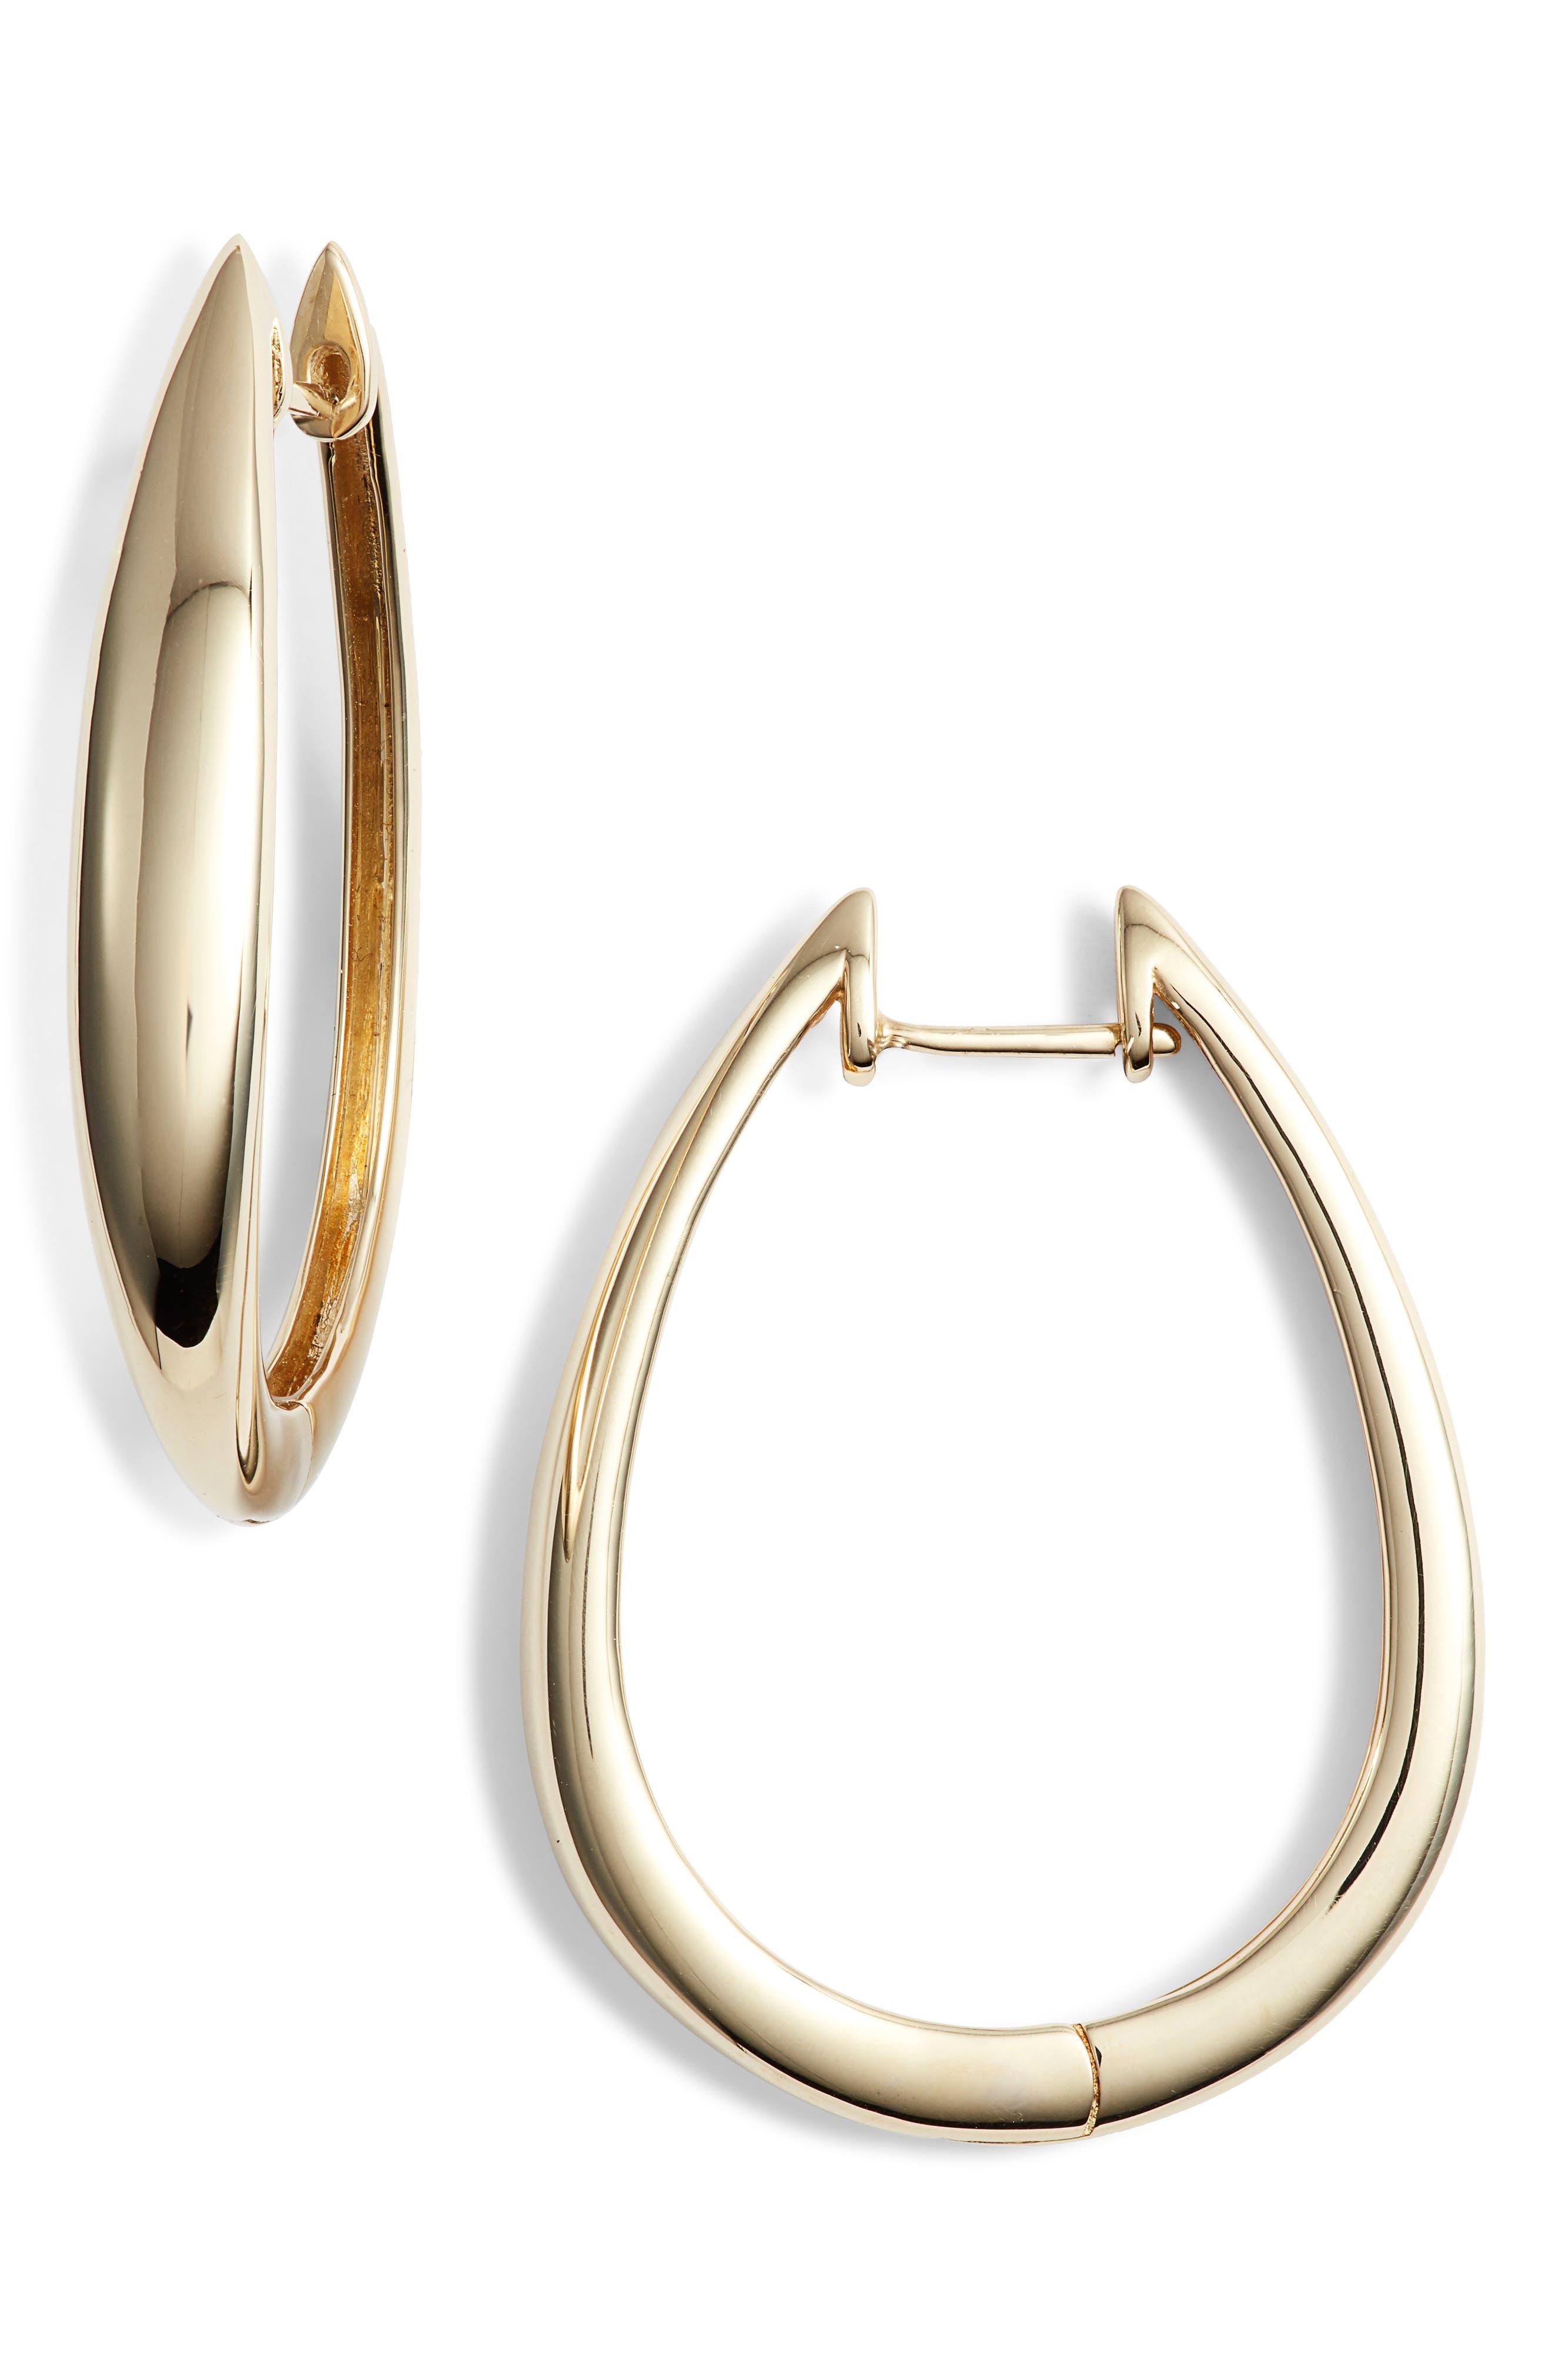 14K Gold Hoop Earrings,                         Main,                         color, YELLOW GOLD/ DIA